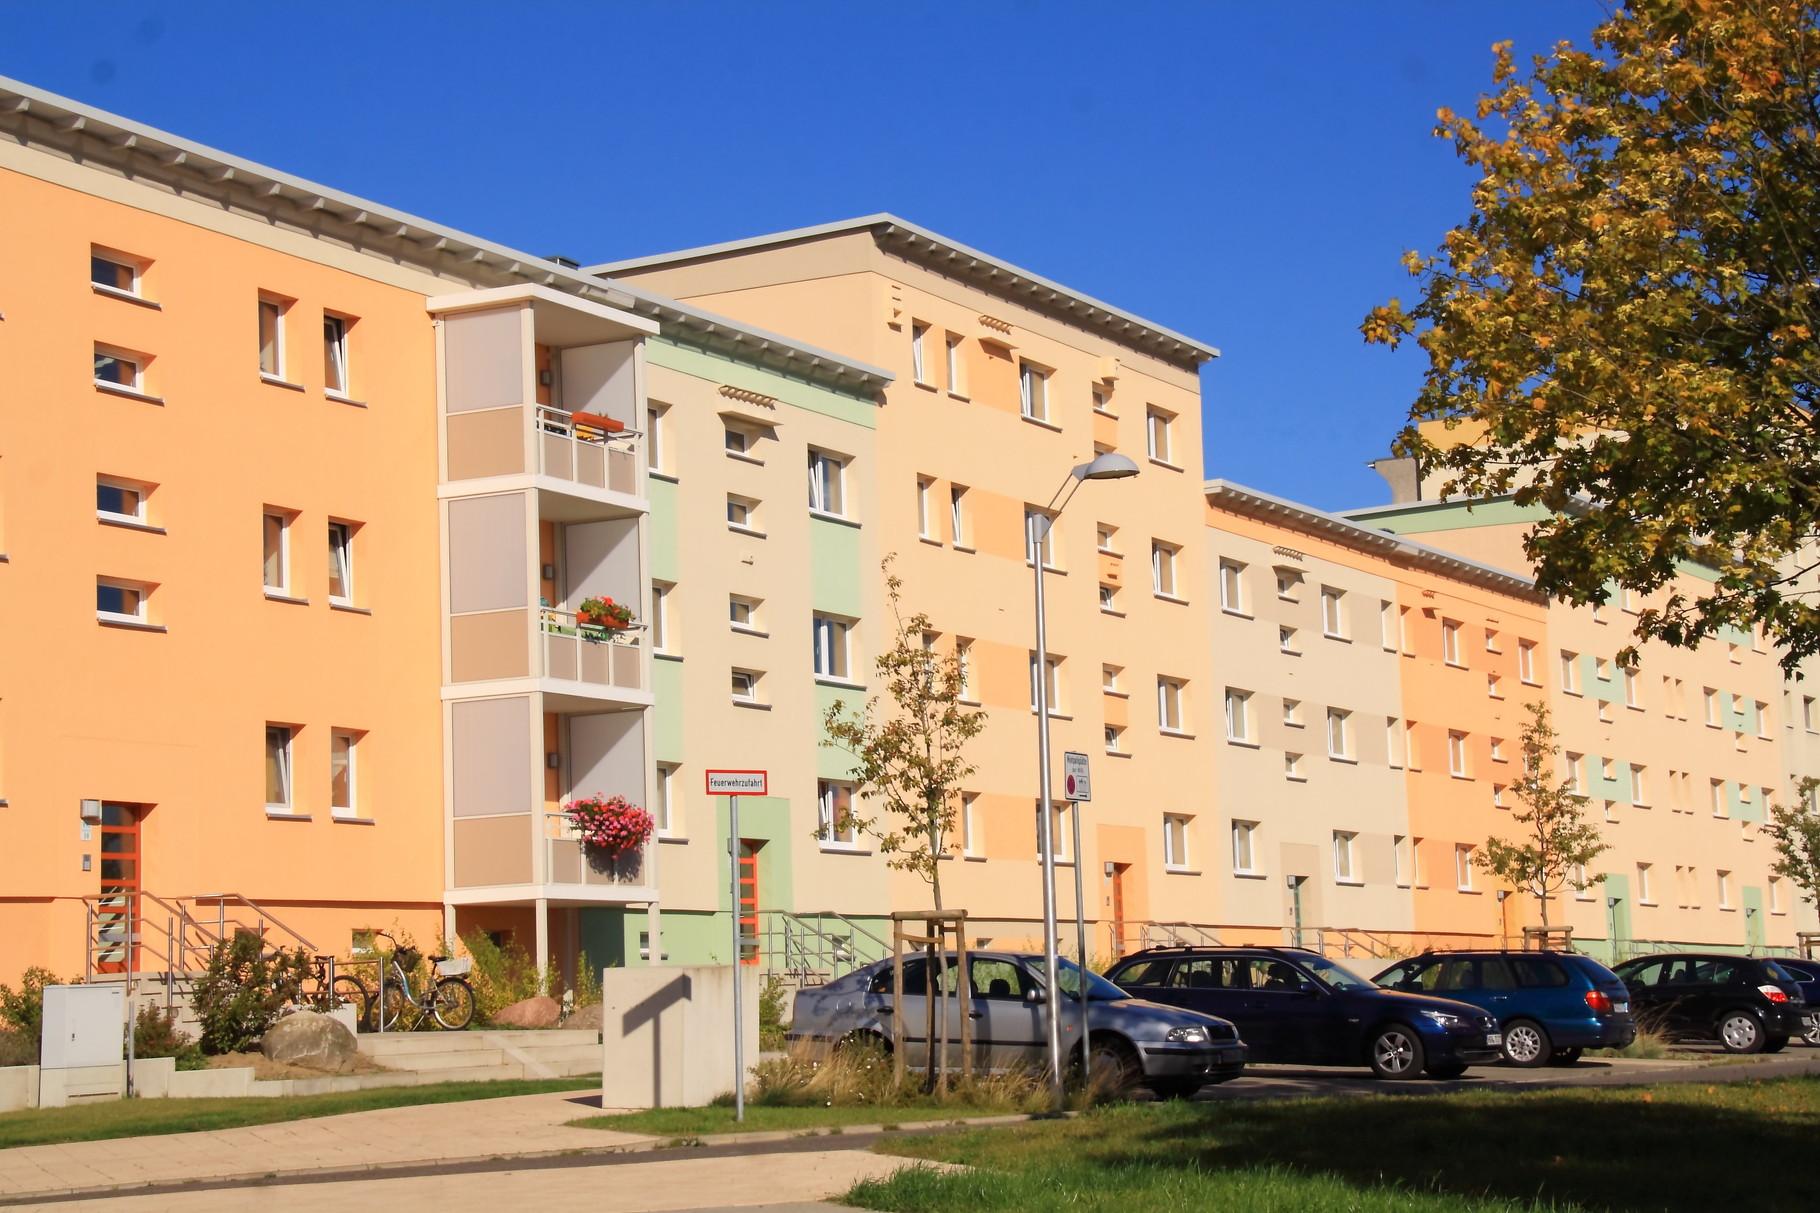 Greifswald, Wohngebäude Helsinkiring 11-13